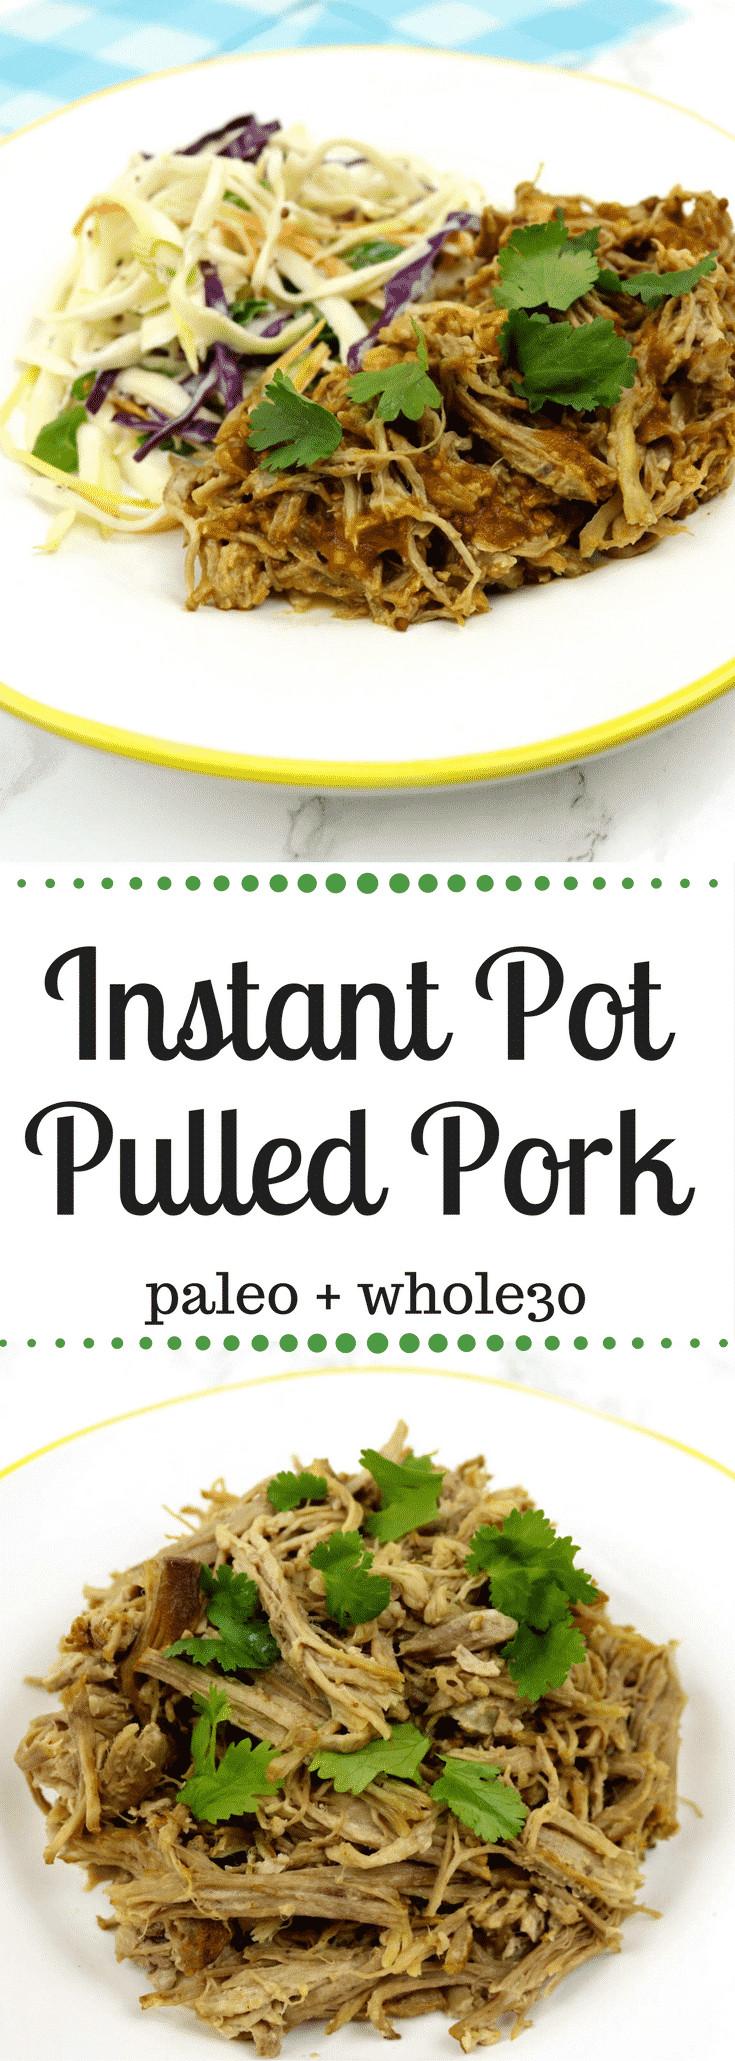 Instant Pot Paleo Recipes  Instant Pot Pulled Pork Paleo Whole30 Recipe